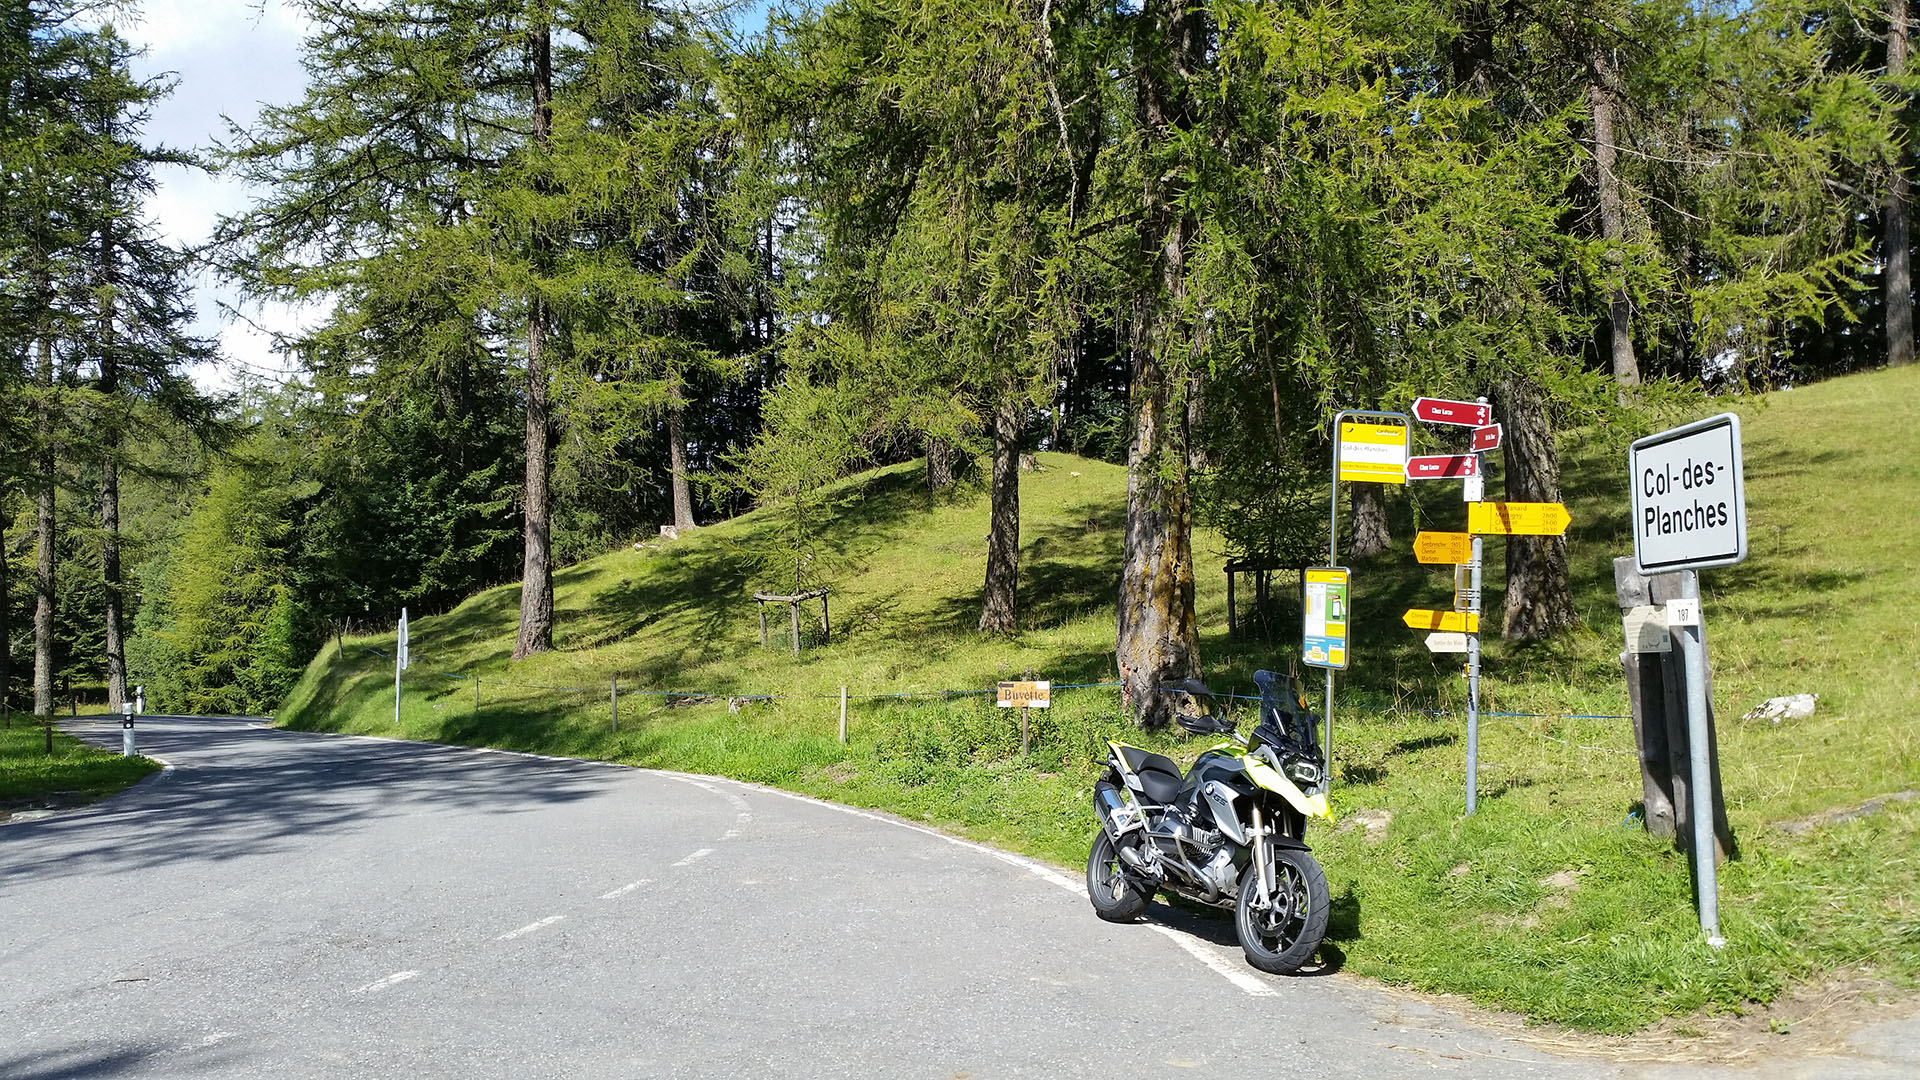 1411 - CH - Col des Planches